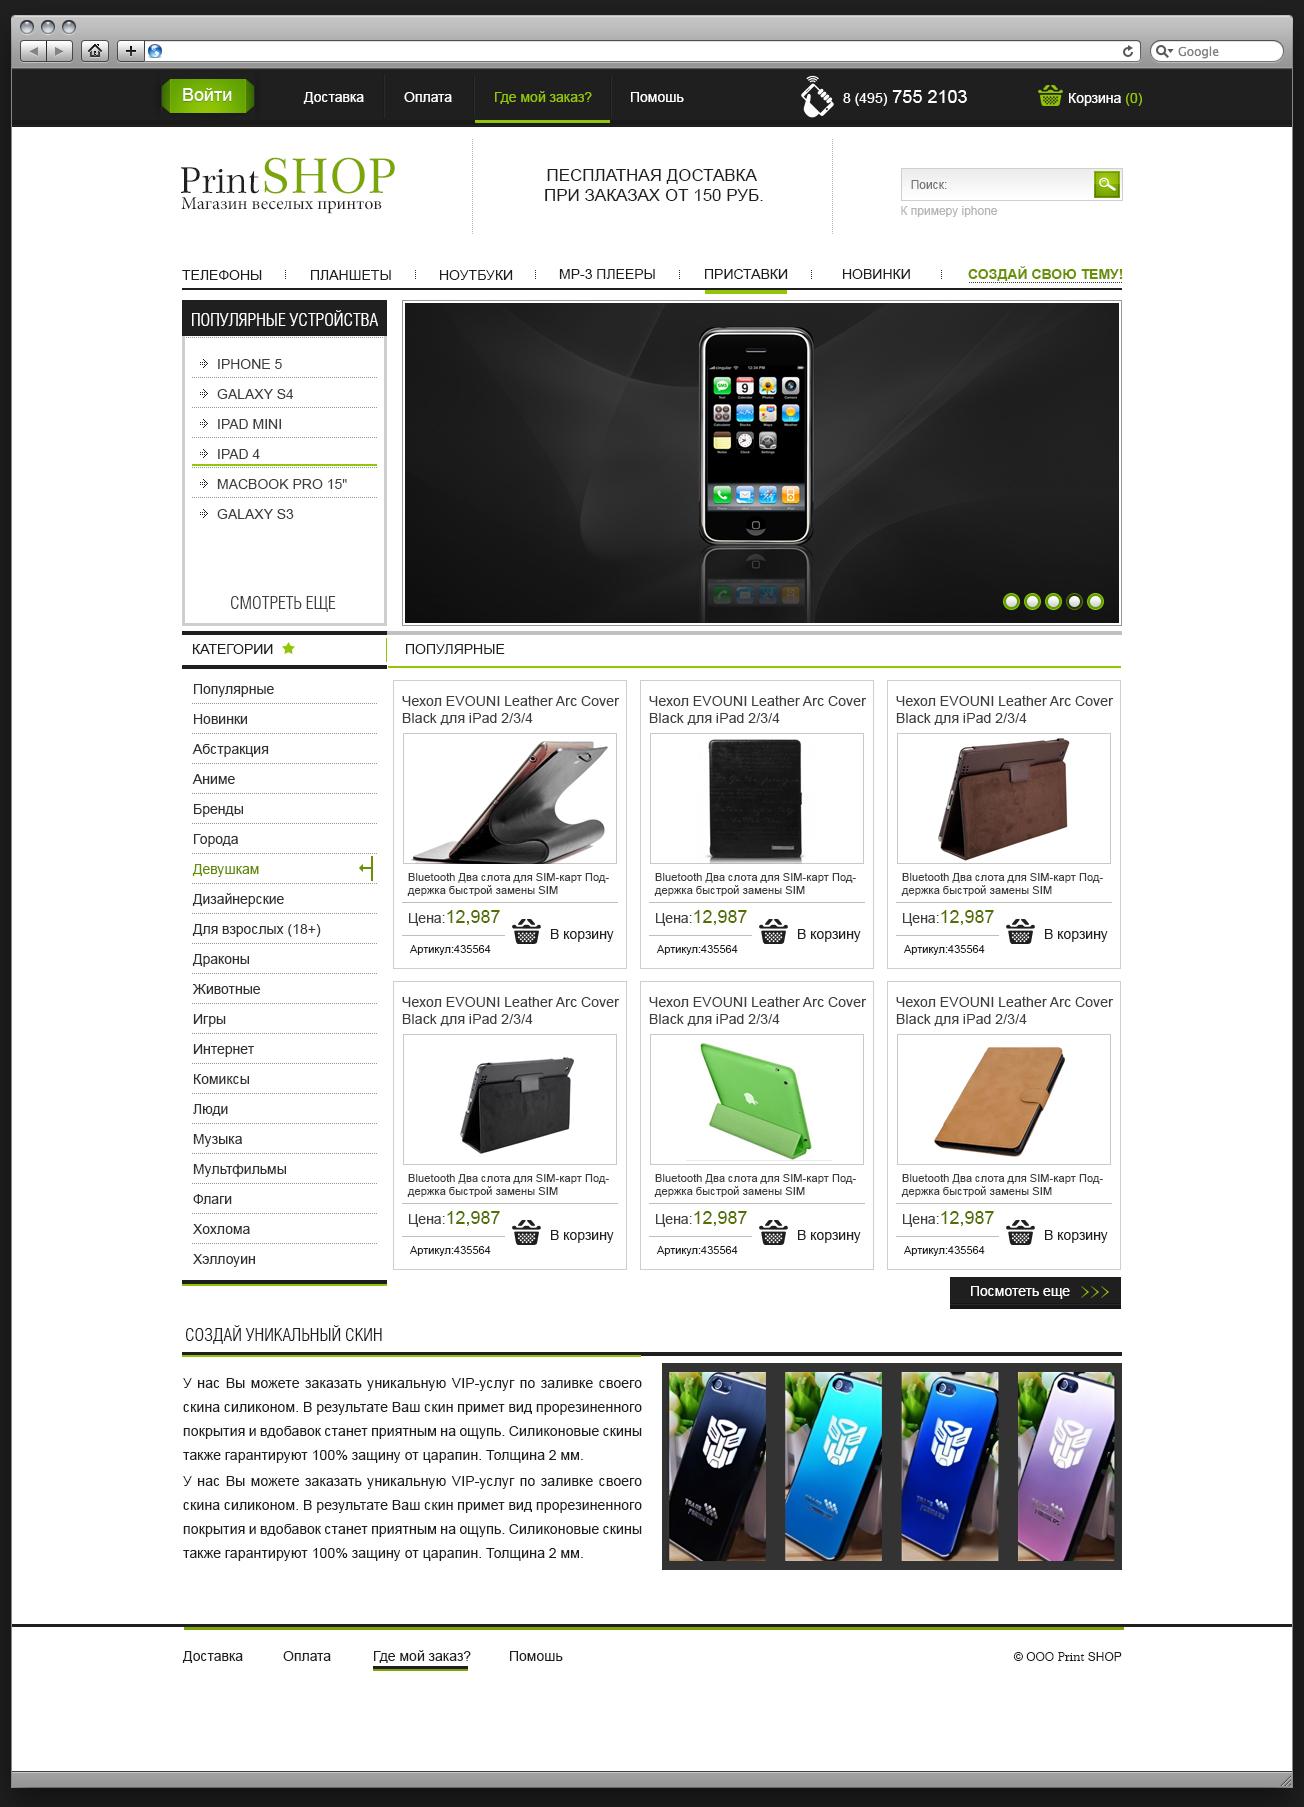 Принт шоп интернет магазин